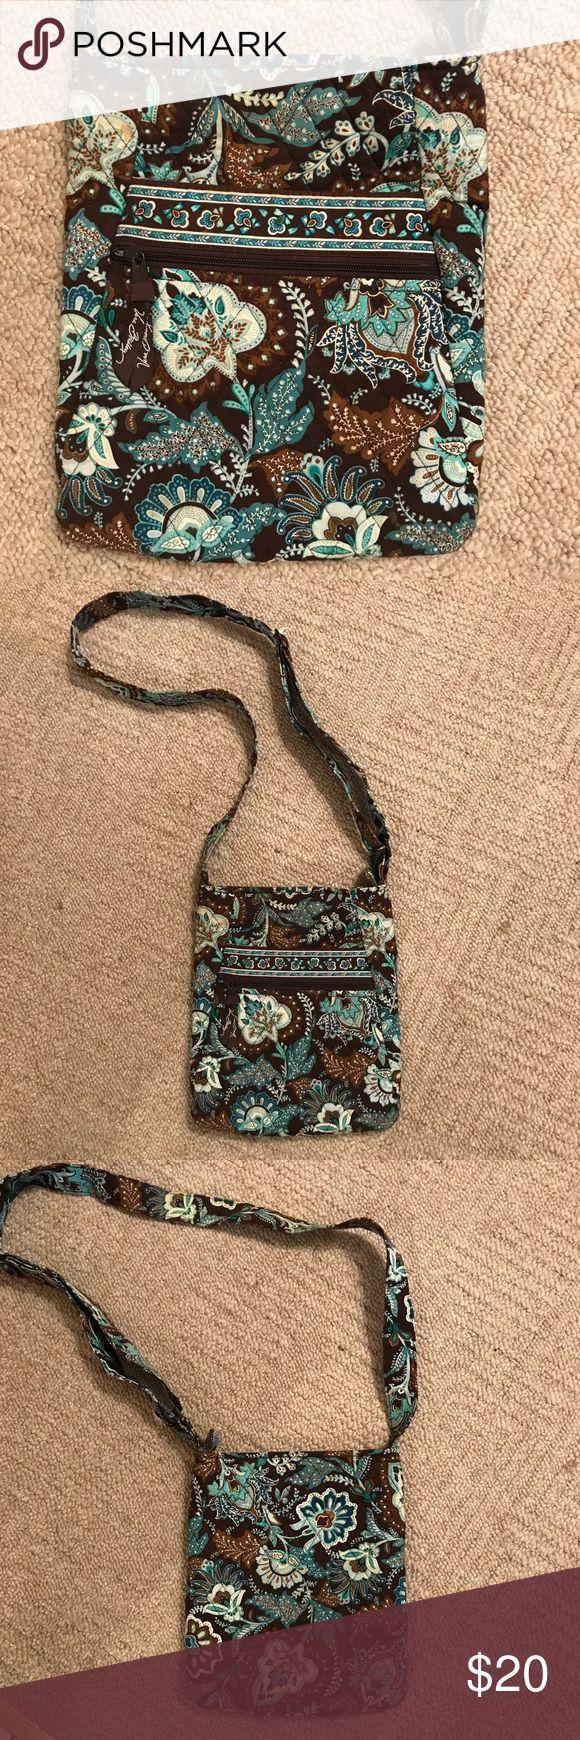 Selling this Vera Bradley Crossbody Purse on Poshmark! My username is: clcasadaban. #shopmycloset #poshmark #fashion #shopping #style #forsale #Vera Bradley #Handbags